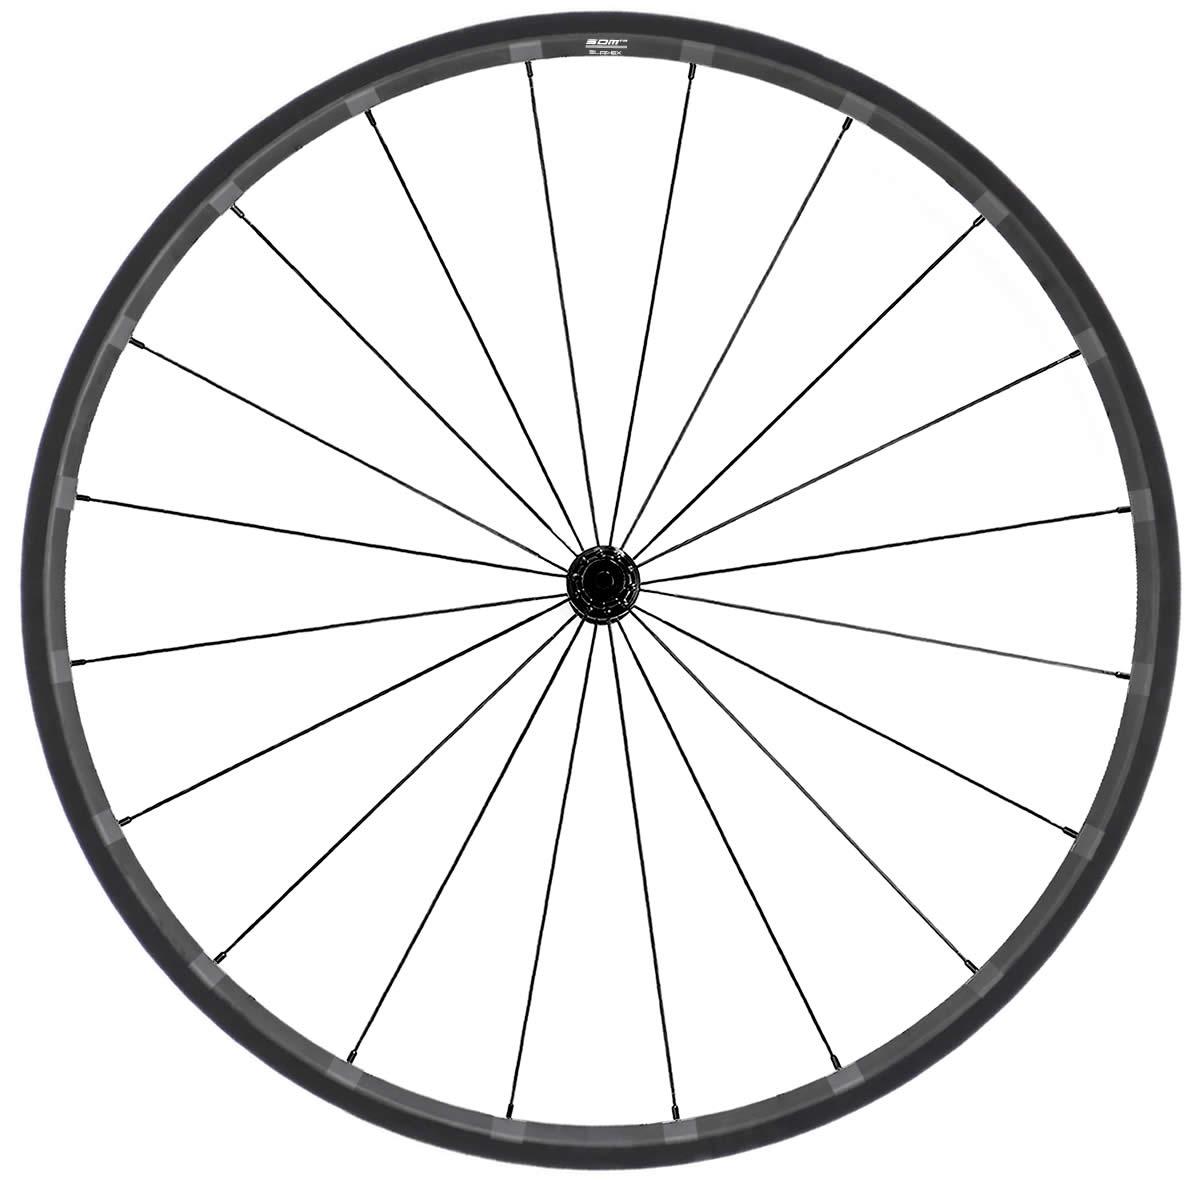 SDM 2X2 Bike Wheel Front